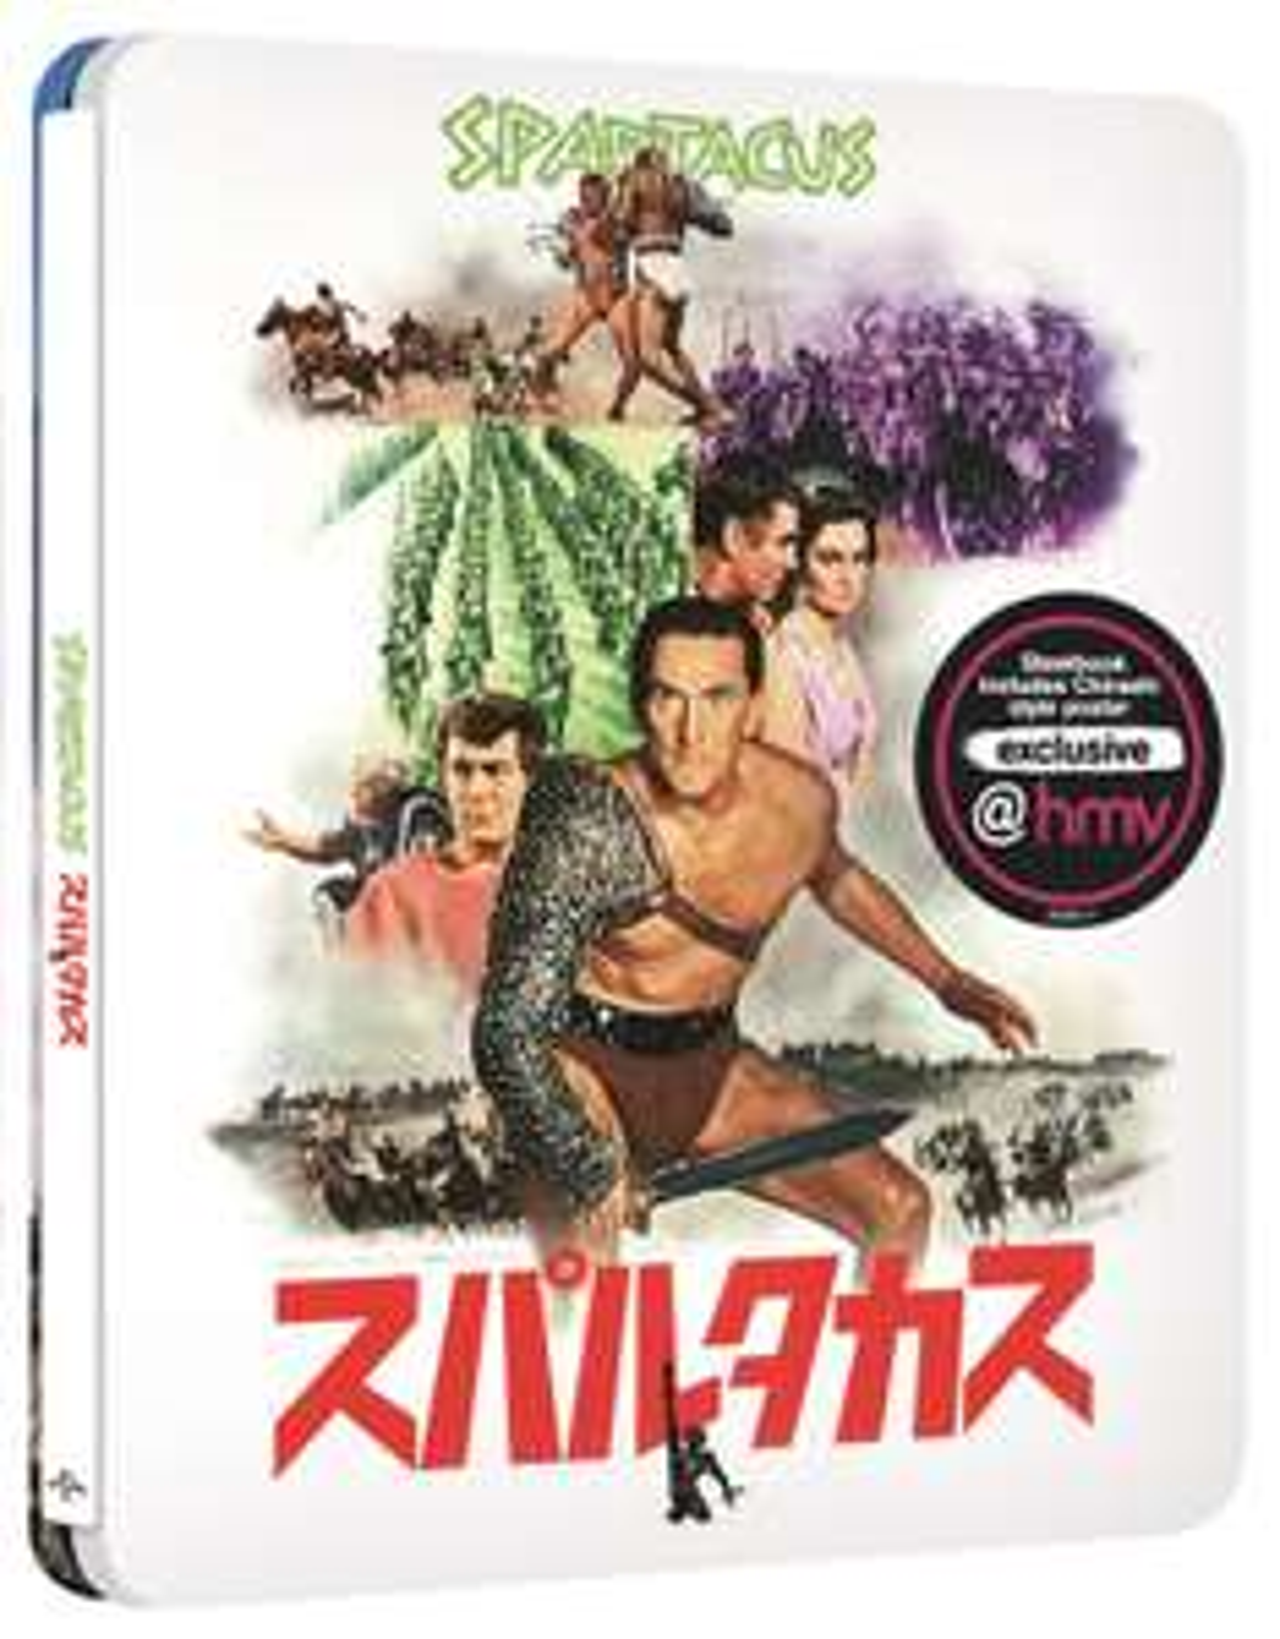 Spartacus (hmv Exclusive) - Japanese Artwork Series #7 Limited Edition Steelbook £24.99 HMV